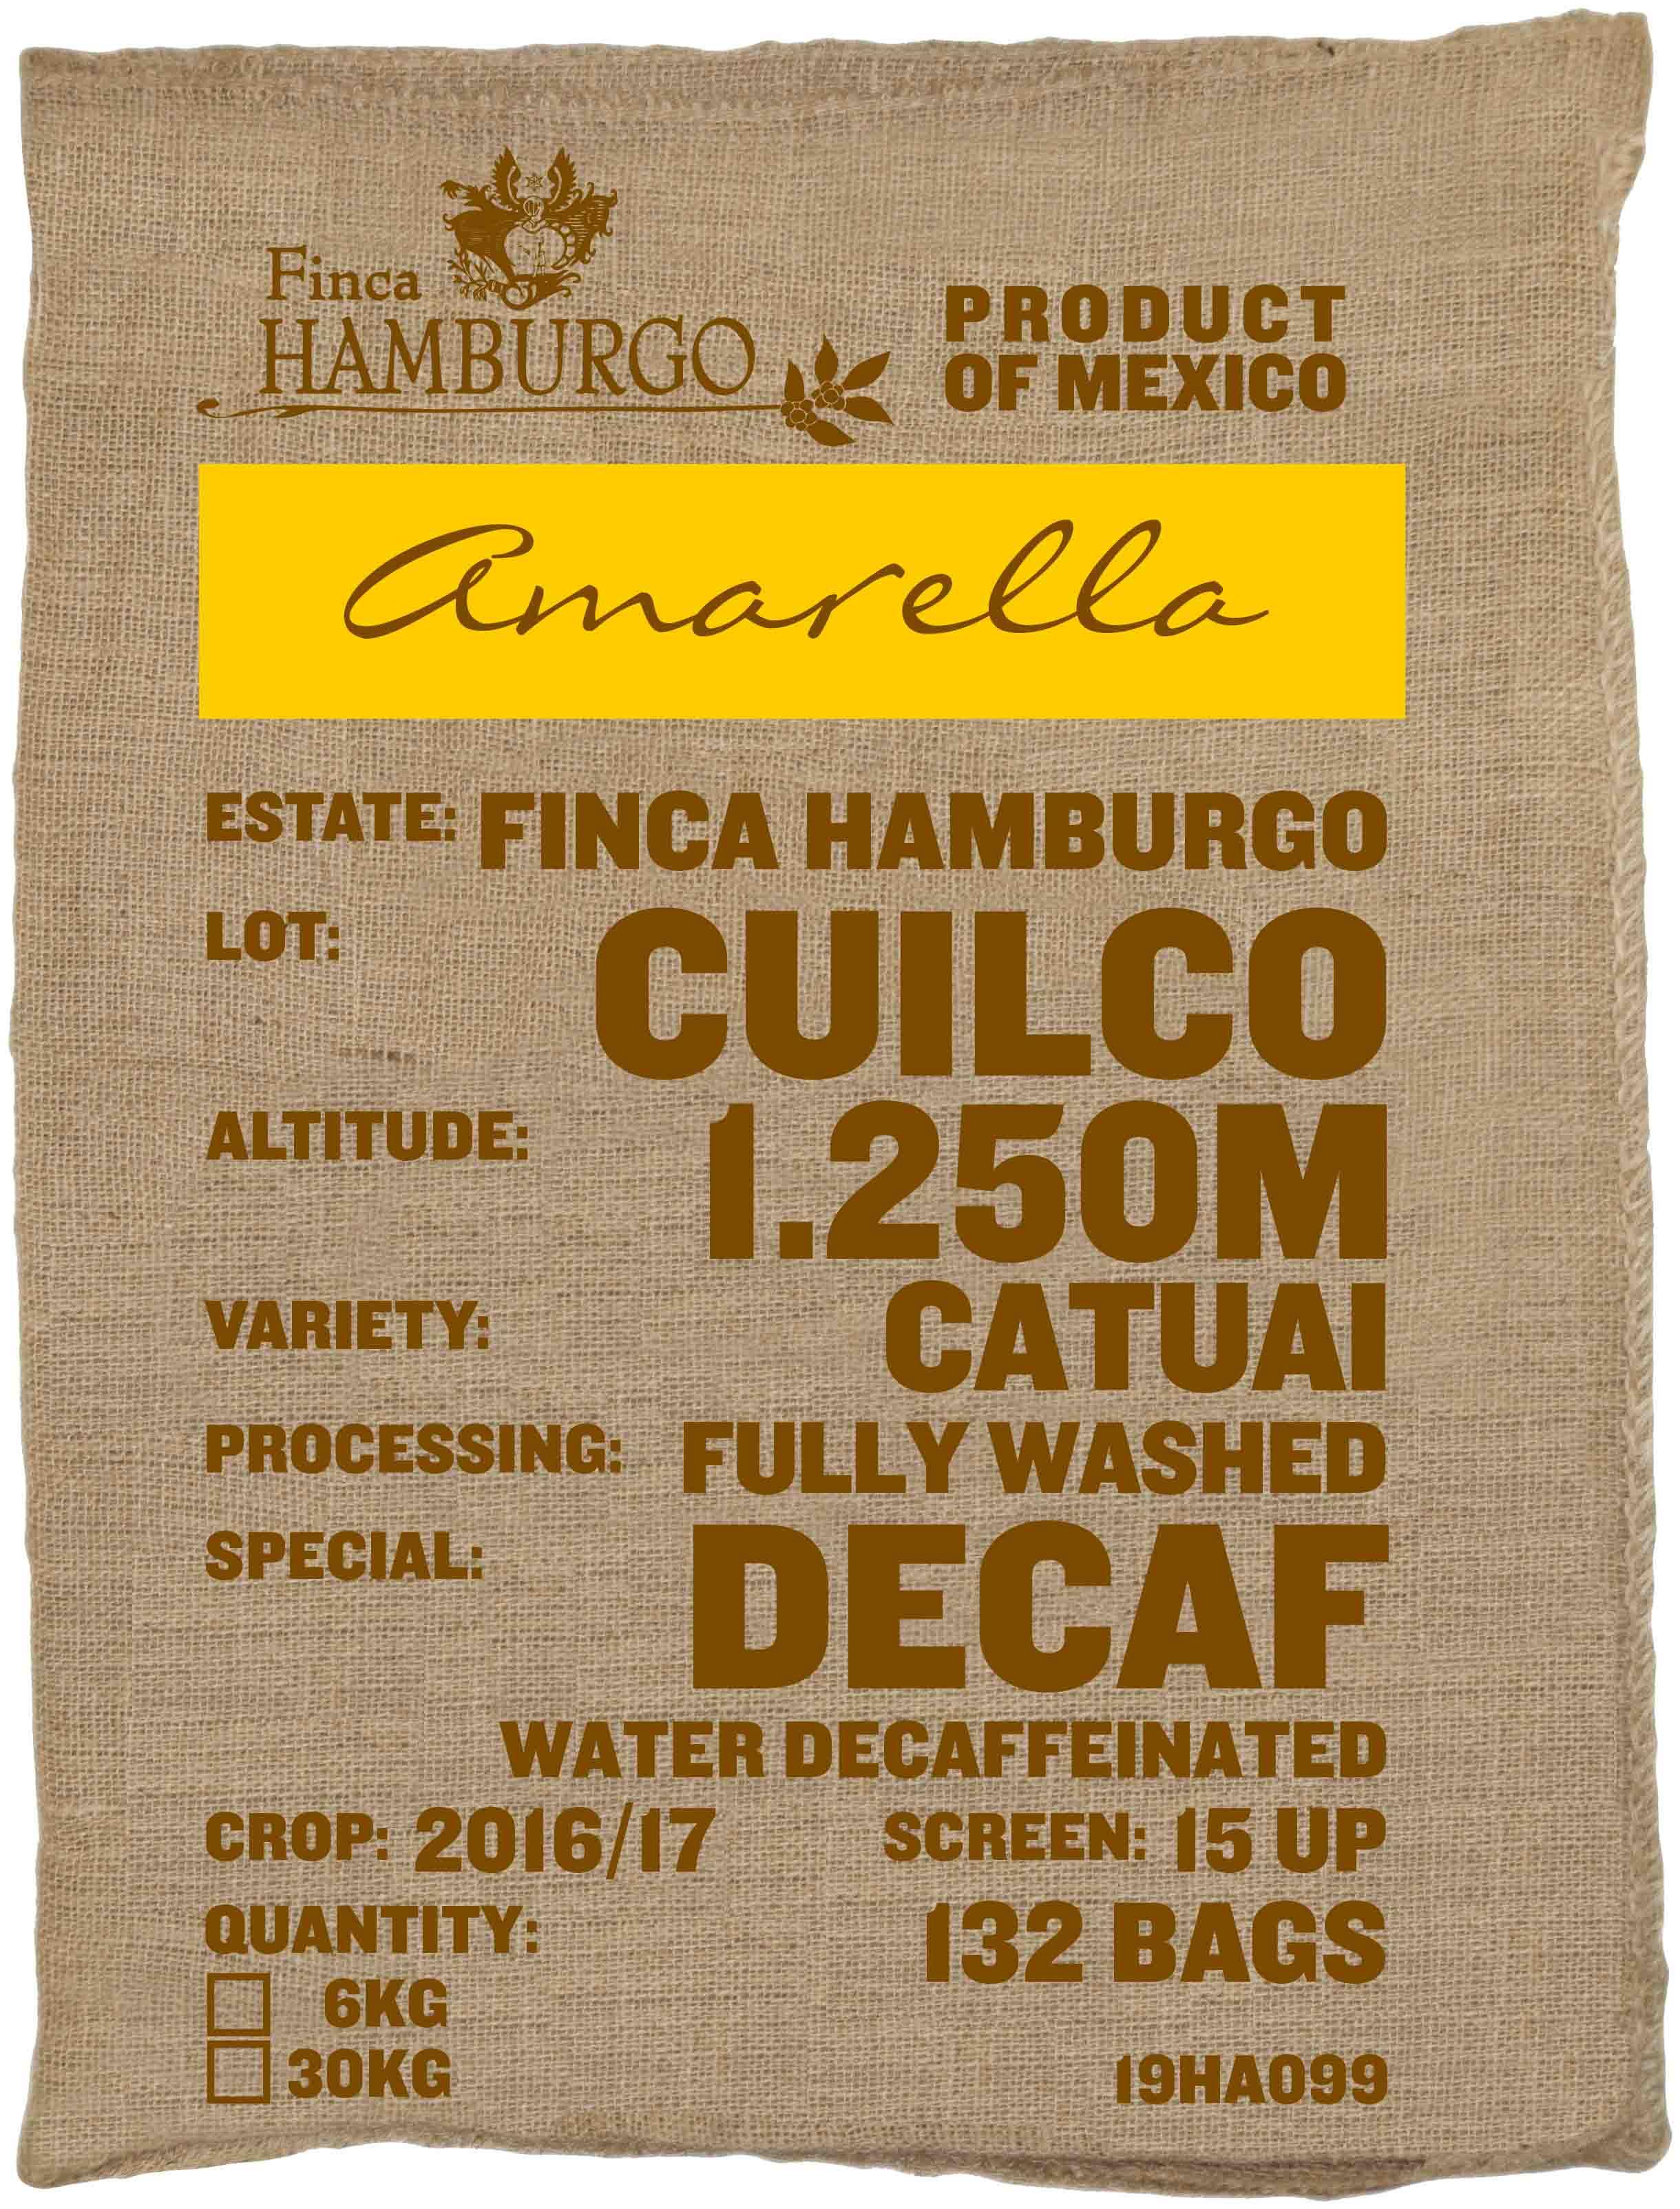 Ein Rohkaffeesack amarella Parzellenkaffee Varietät Catuia Decaf. Finca Hamburgo Lot Cuilco.